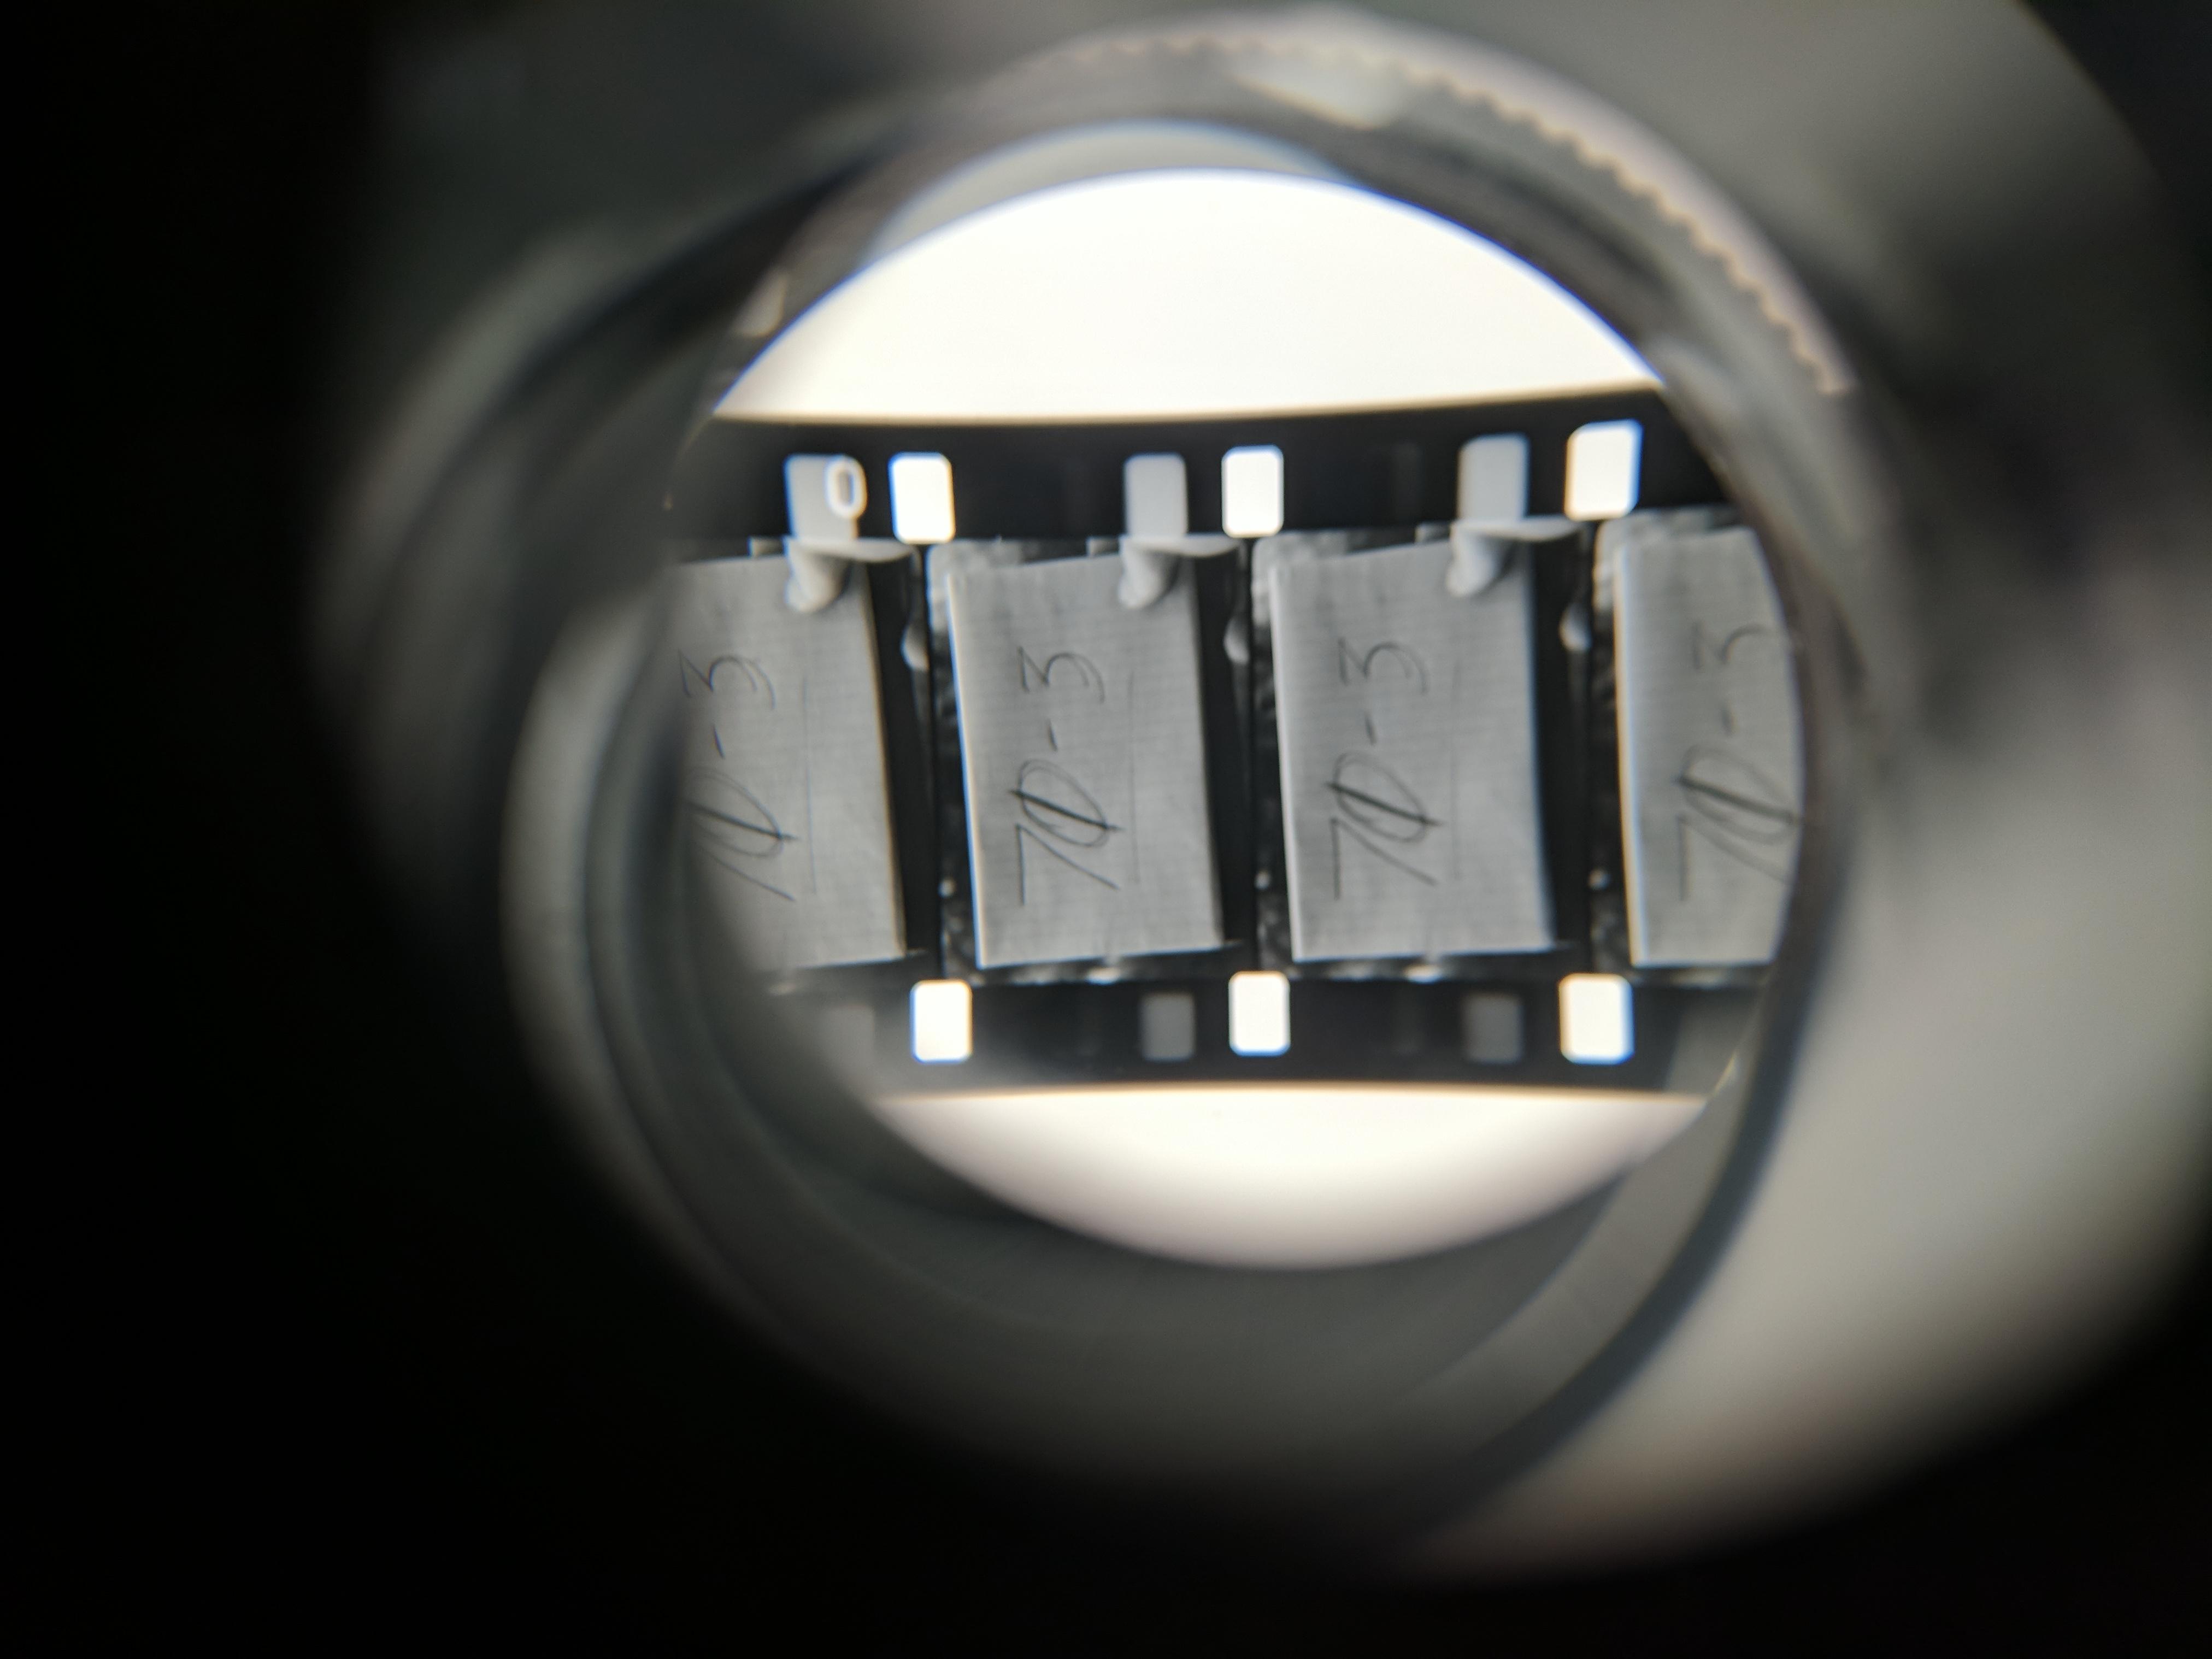 Audiovisual Media Preservation Initiative (AVMPI)